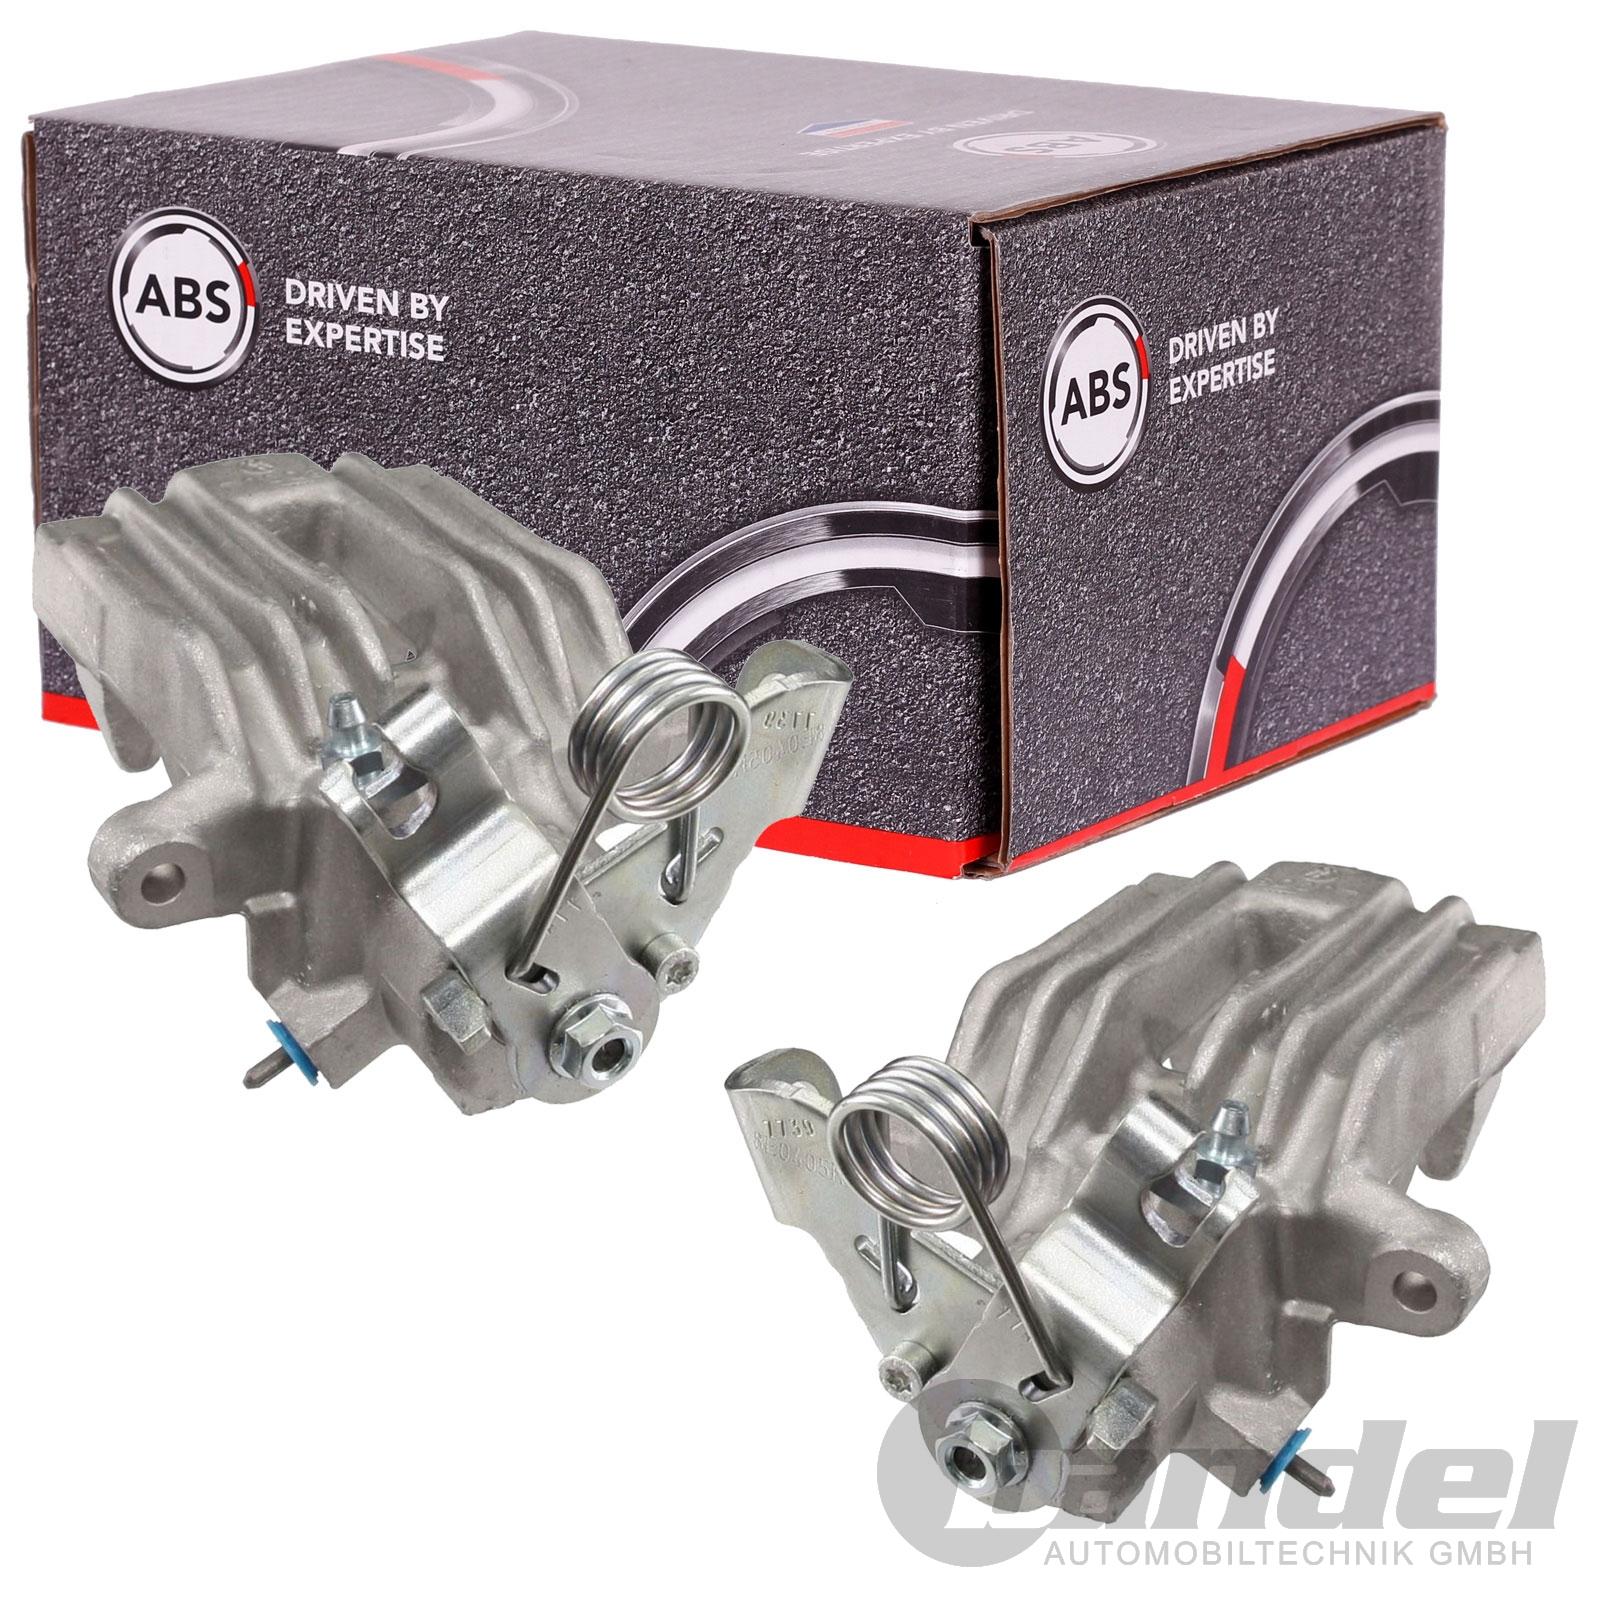 Bremssattel Hinten Rechts Links für Audi A4 Avant B6 B7 Cabriolet Seat Exeo 3R2